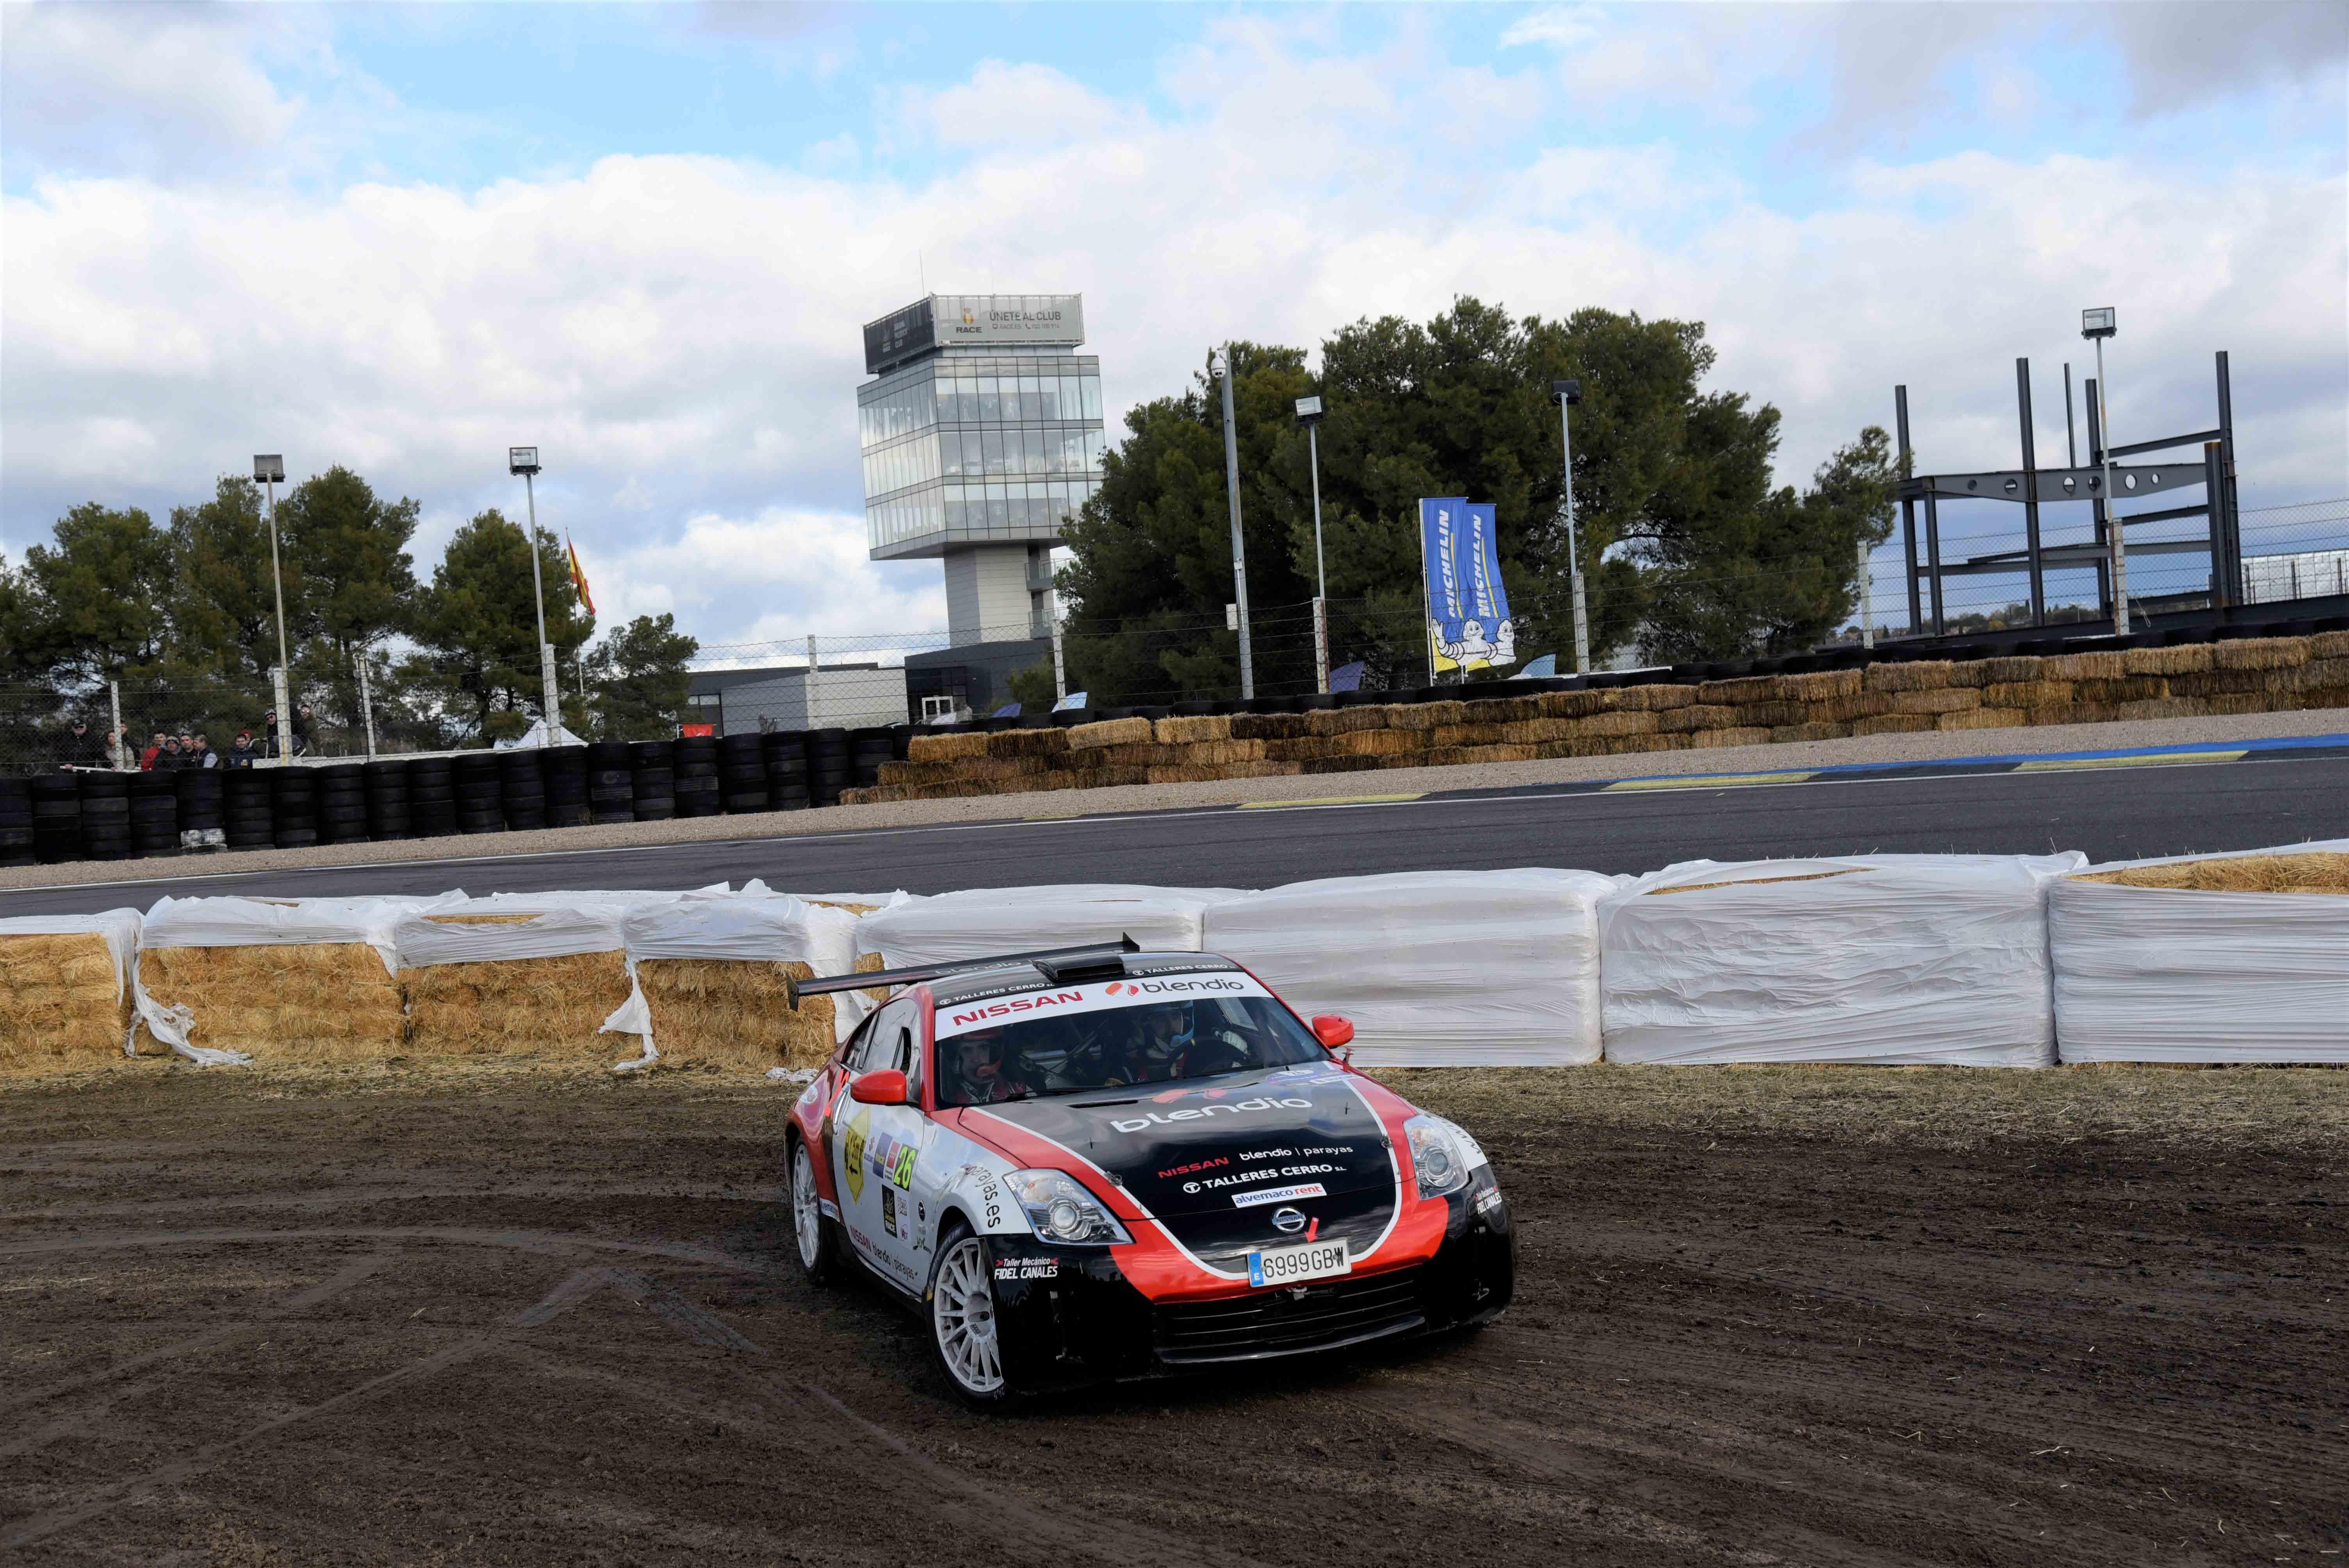 Rallye CAM - RACE 2019 / Imagen: José Luis Alonso (Videosport)